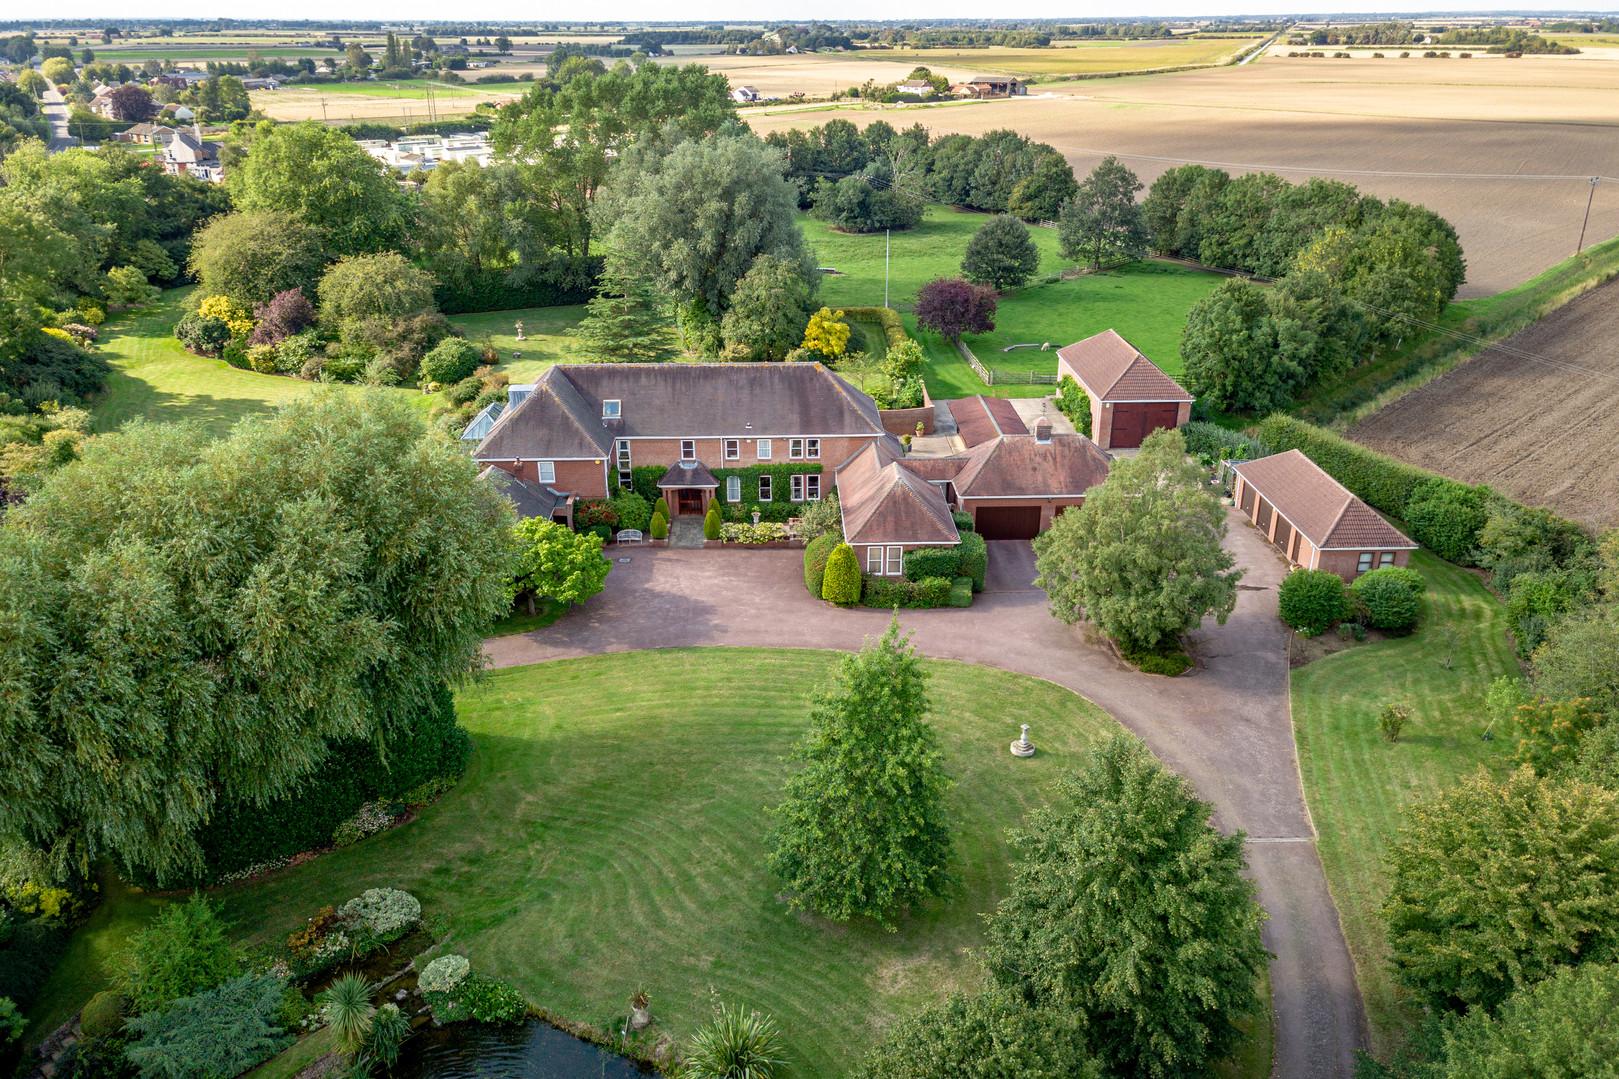 Holland House (Antons Gowt) Aerial-1.jpg